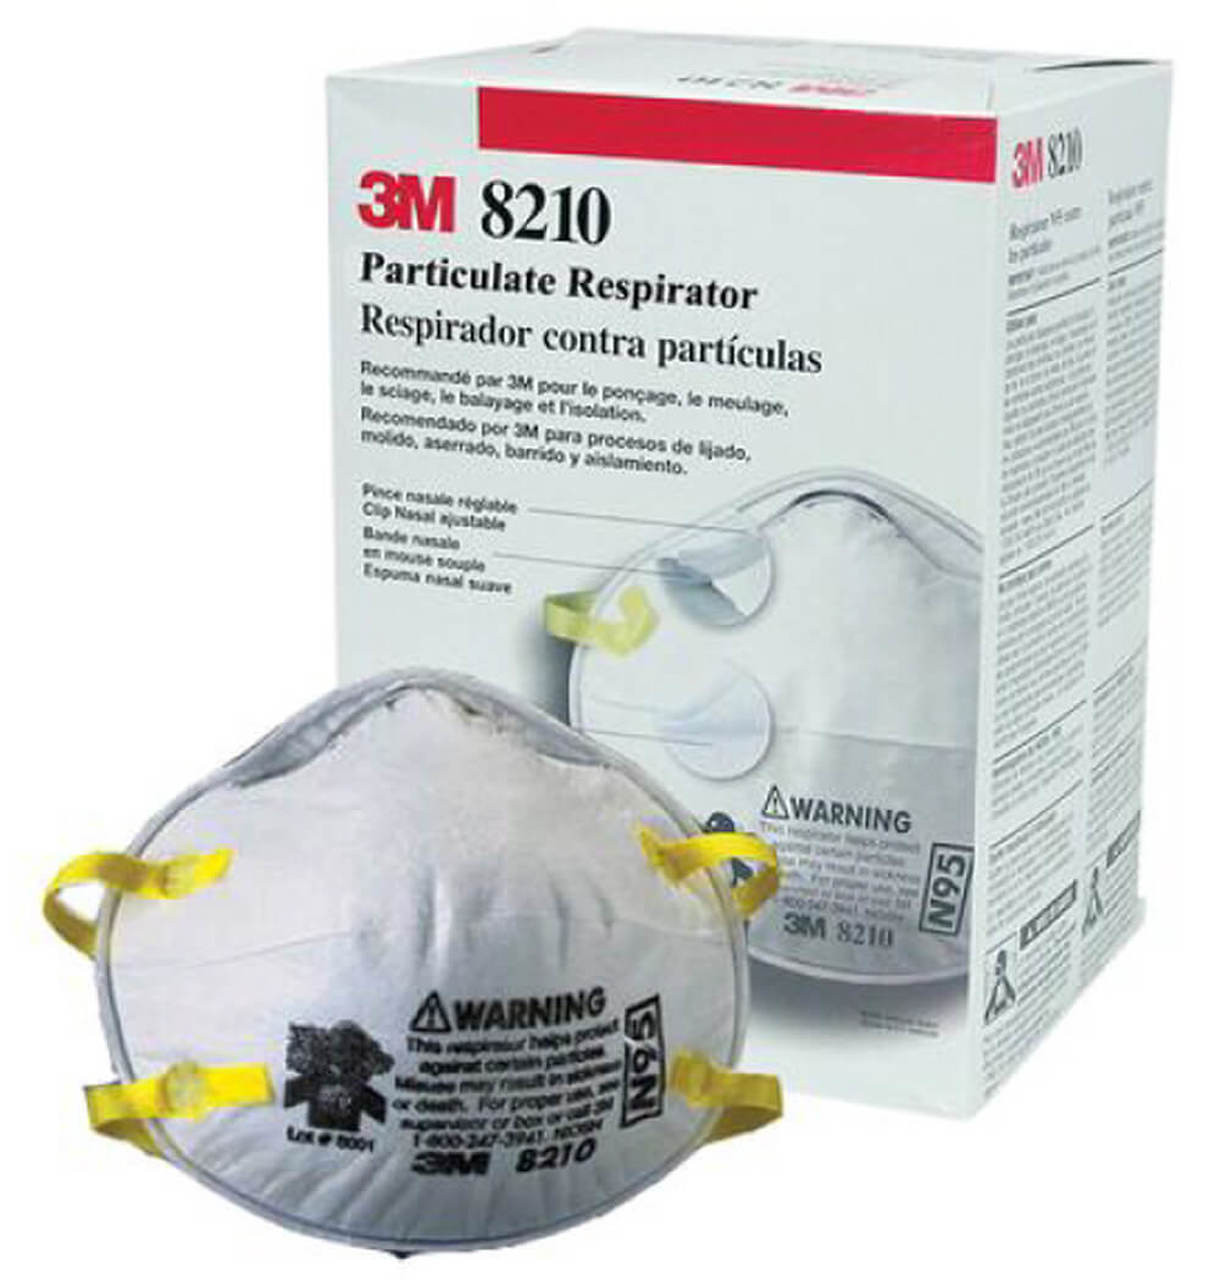 3M8210 N95 Particulate Respirators  - Box of 20